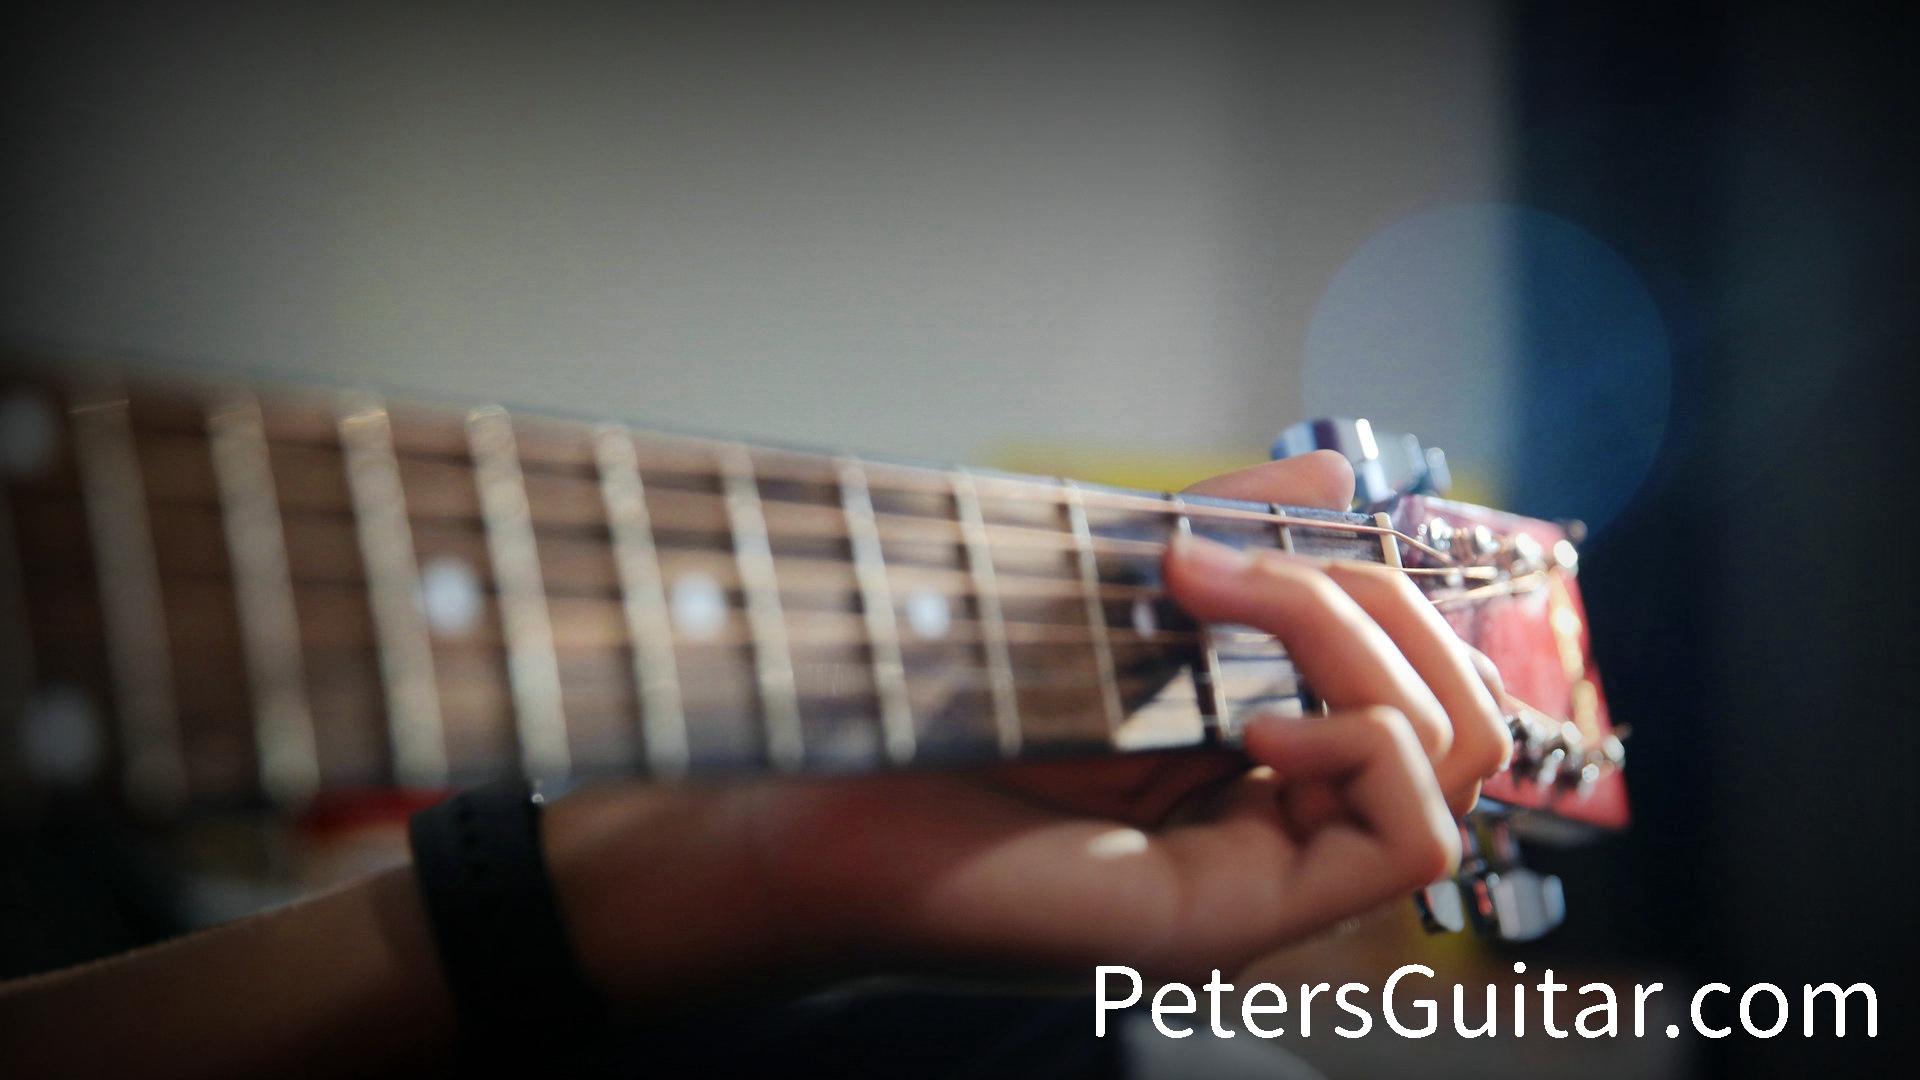 PetersGuitar_com 功夫吉他 温哥华吉他老师18.jpg